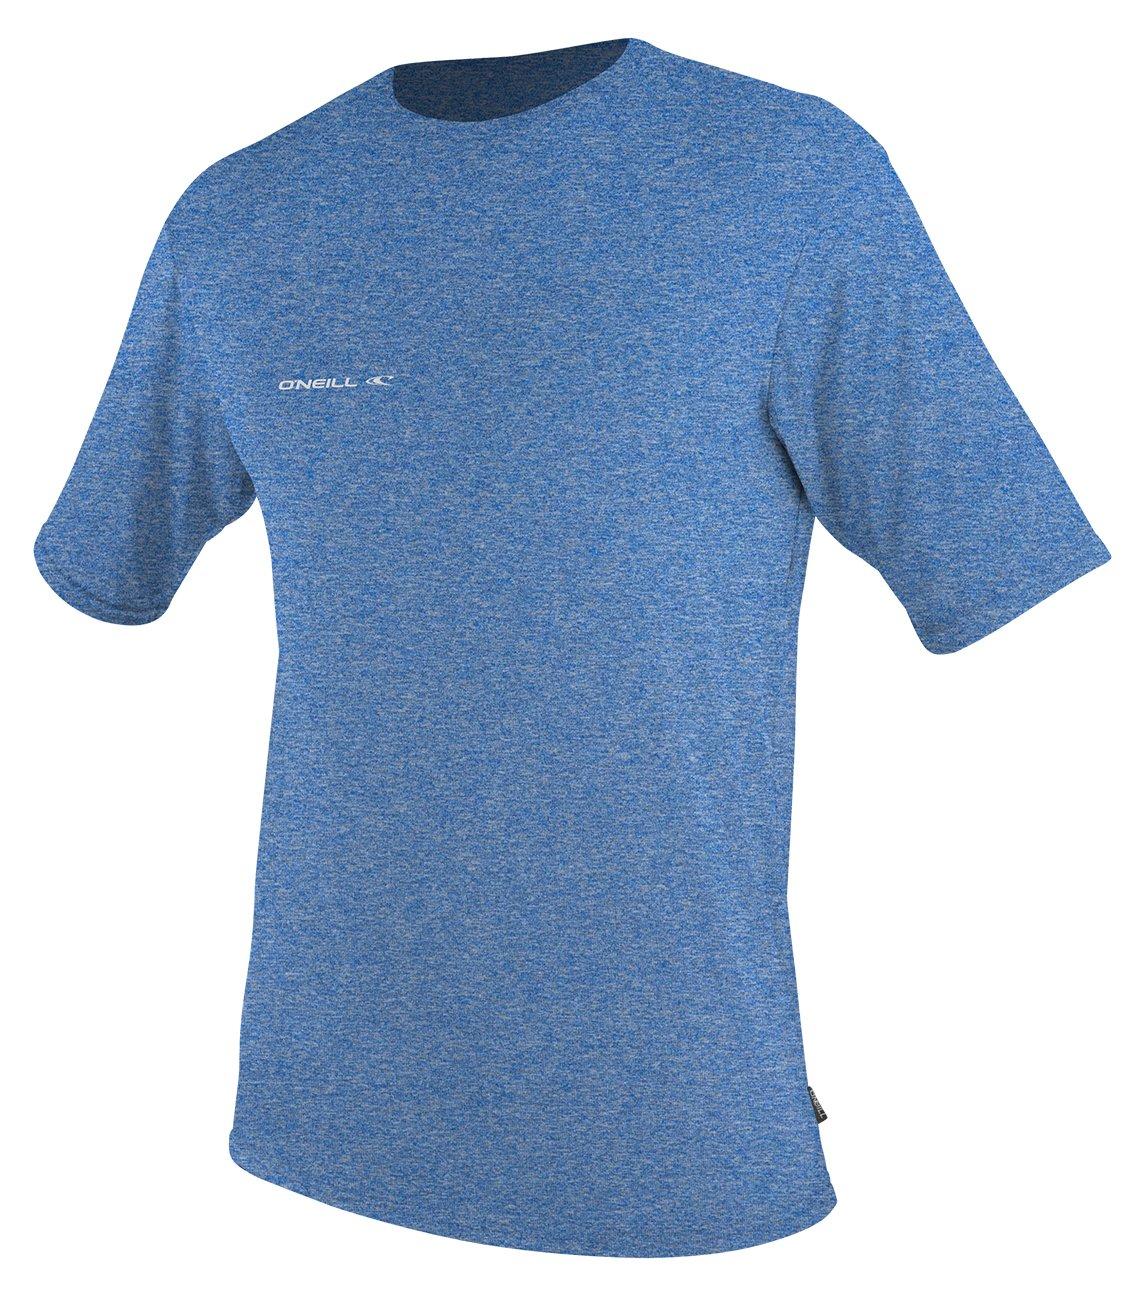 O'Neill Men's UV Sun Protection Hybrid Rash Tee, XX-Large, Brite Blue Hybrid